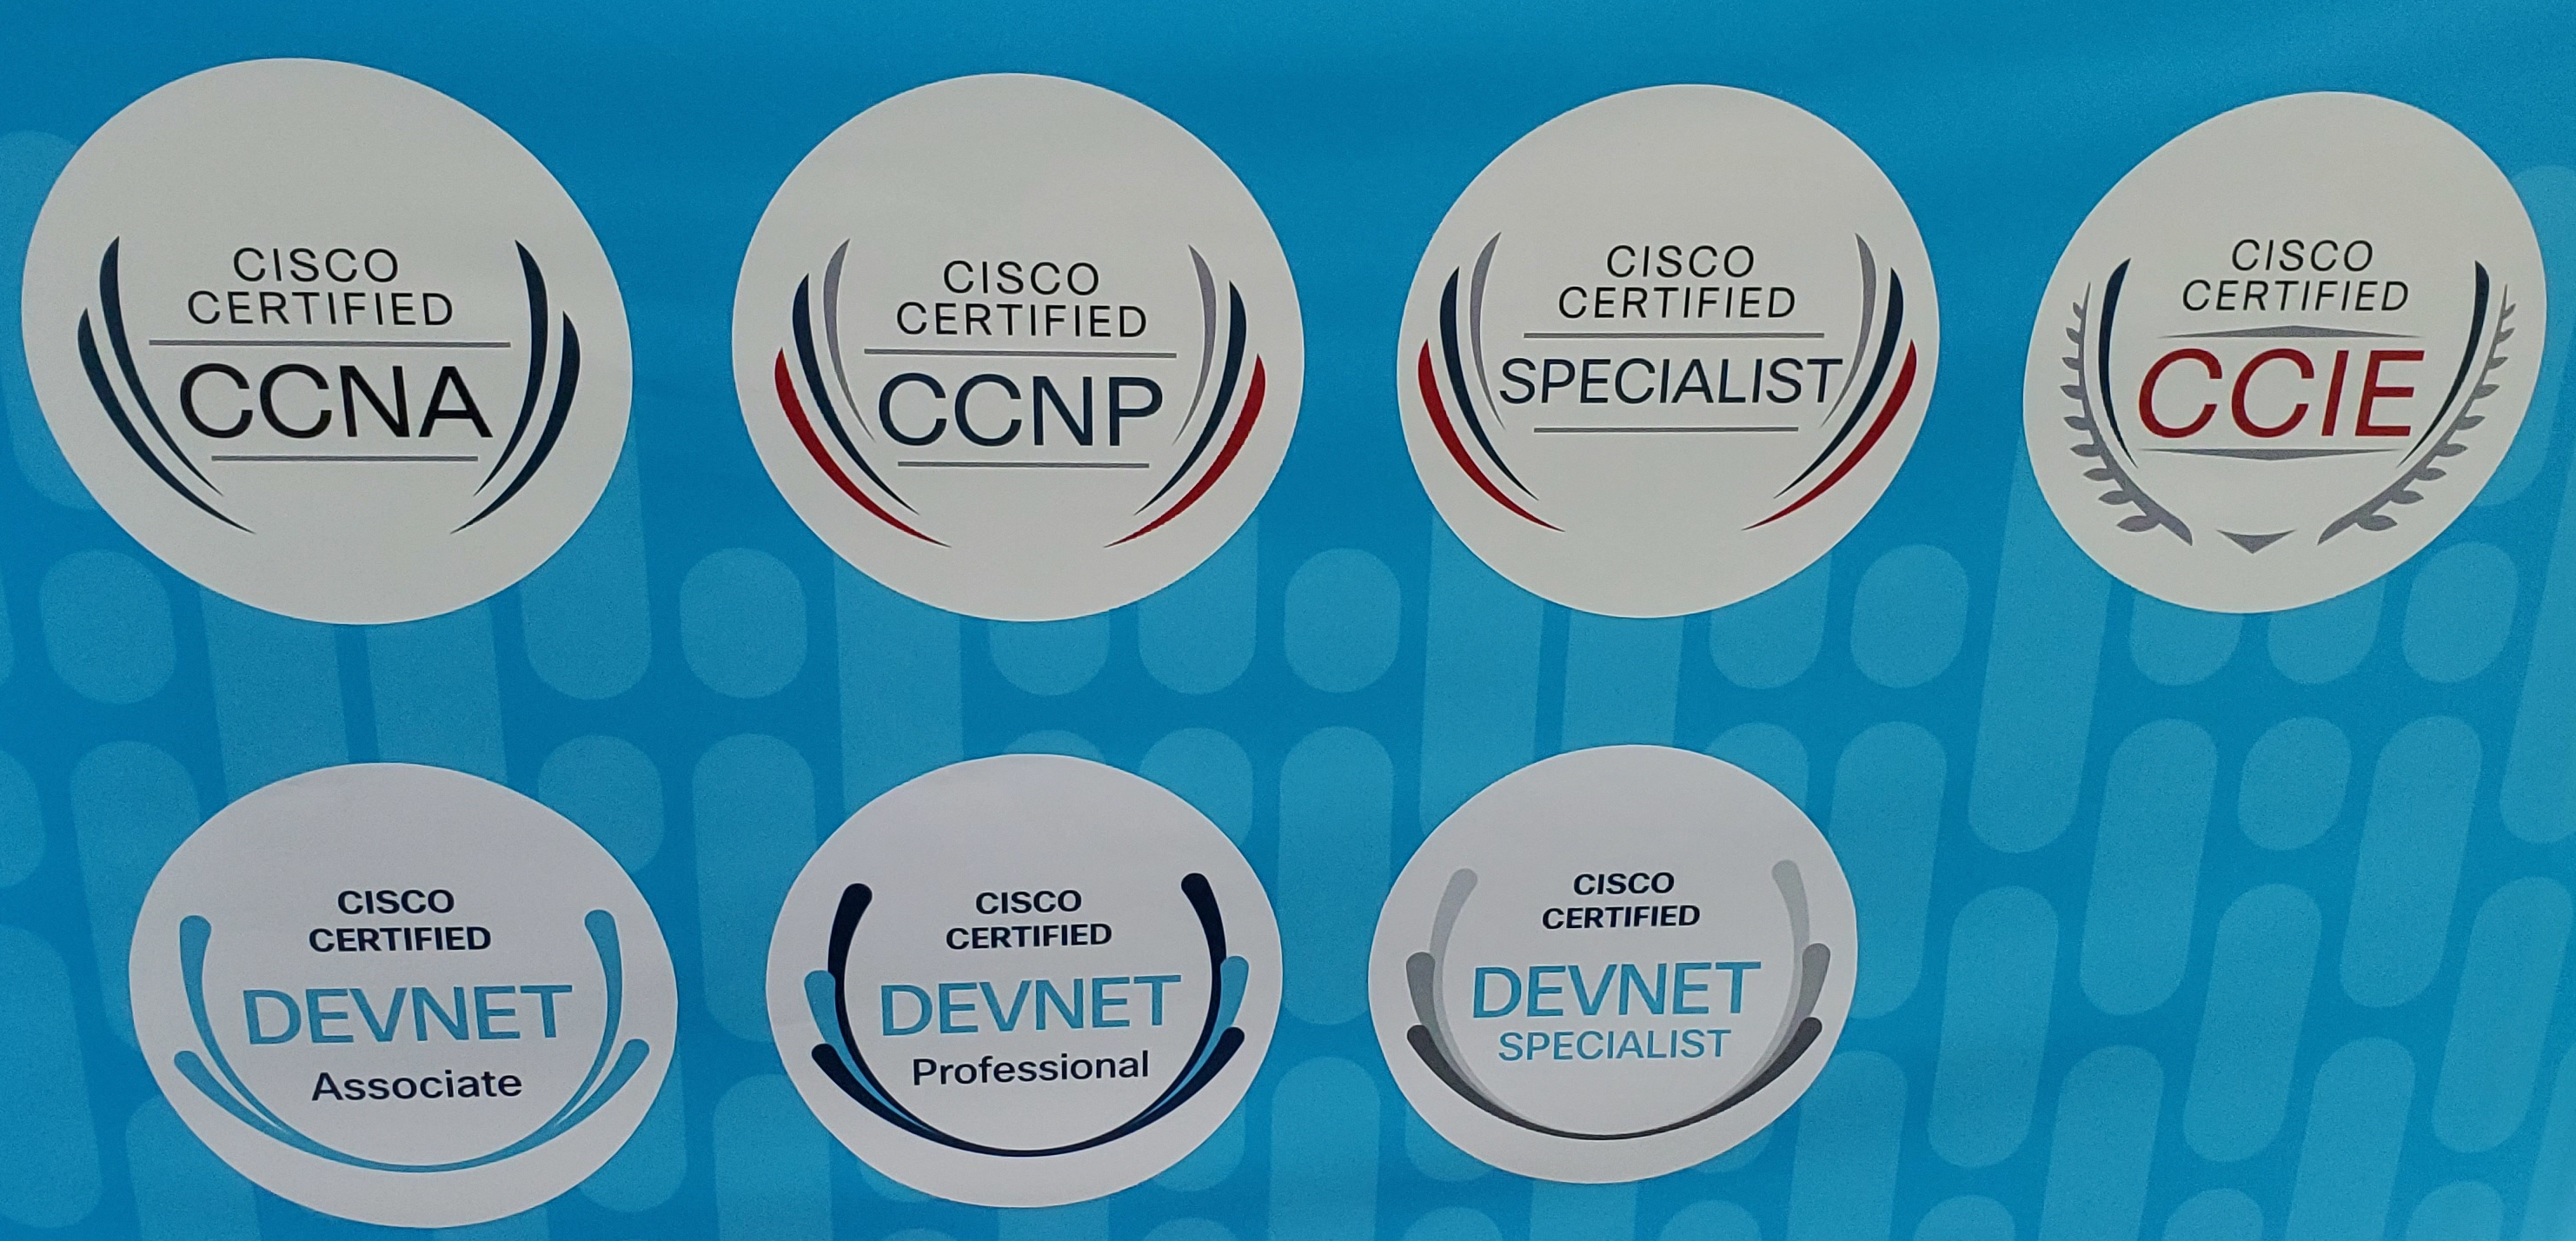 The New Cisco CCNA, Specialist & CCNP Programs - RichTechGuy